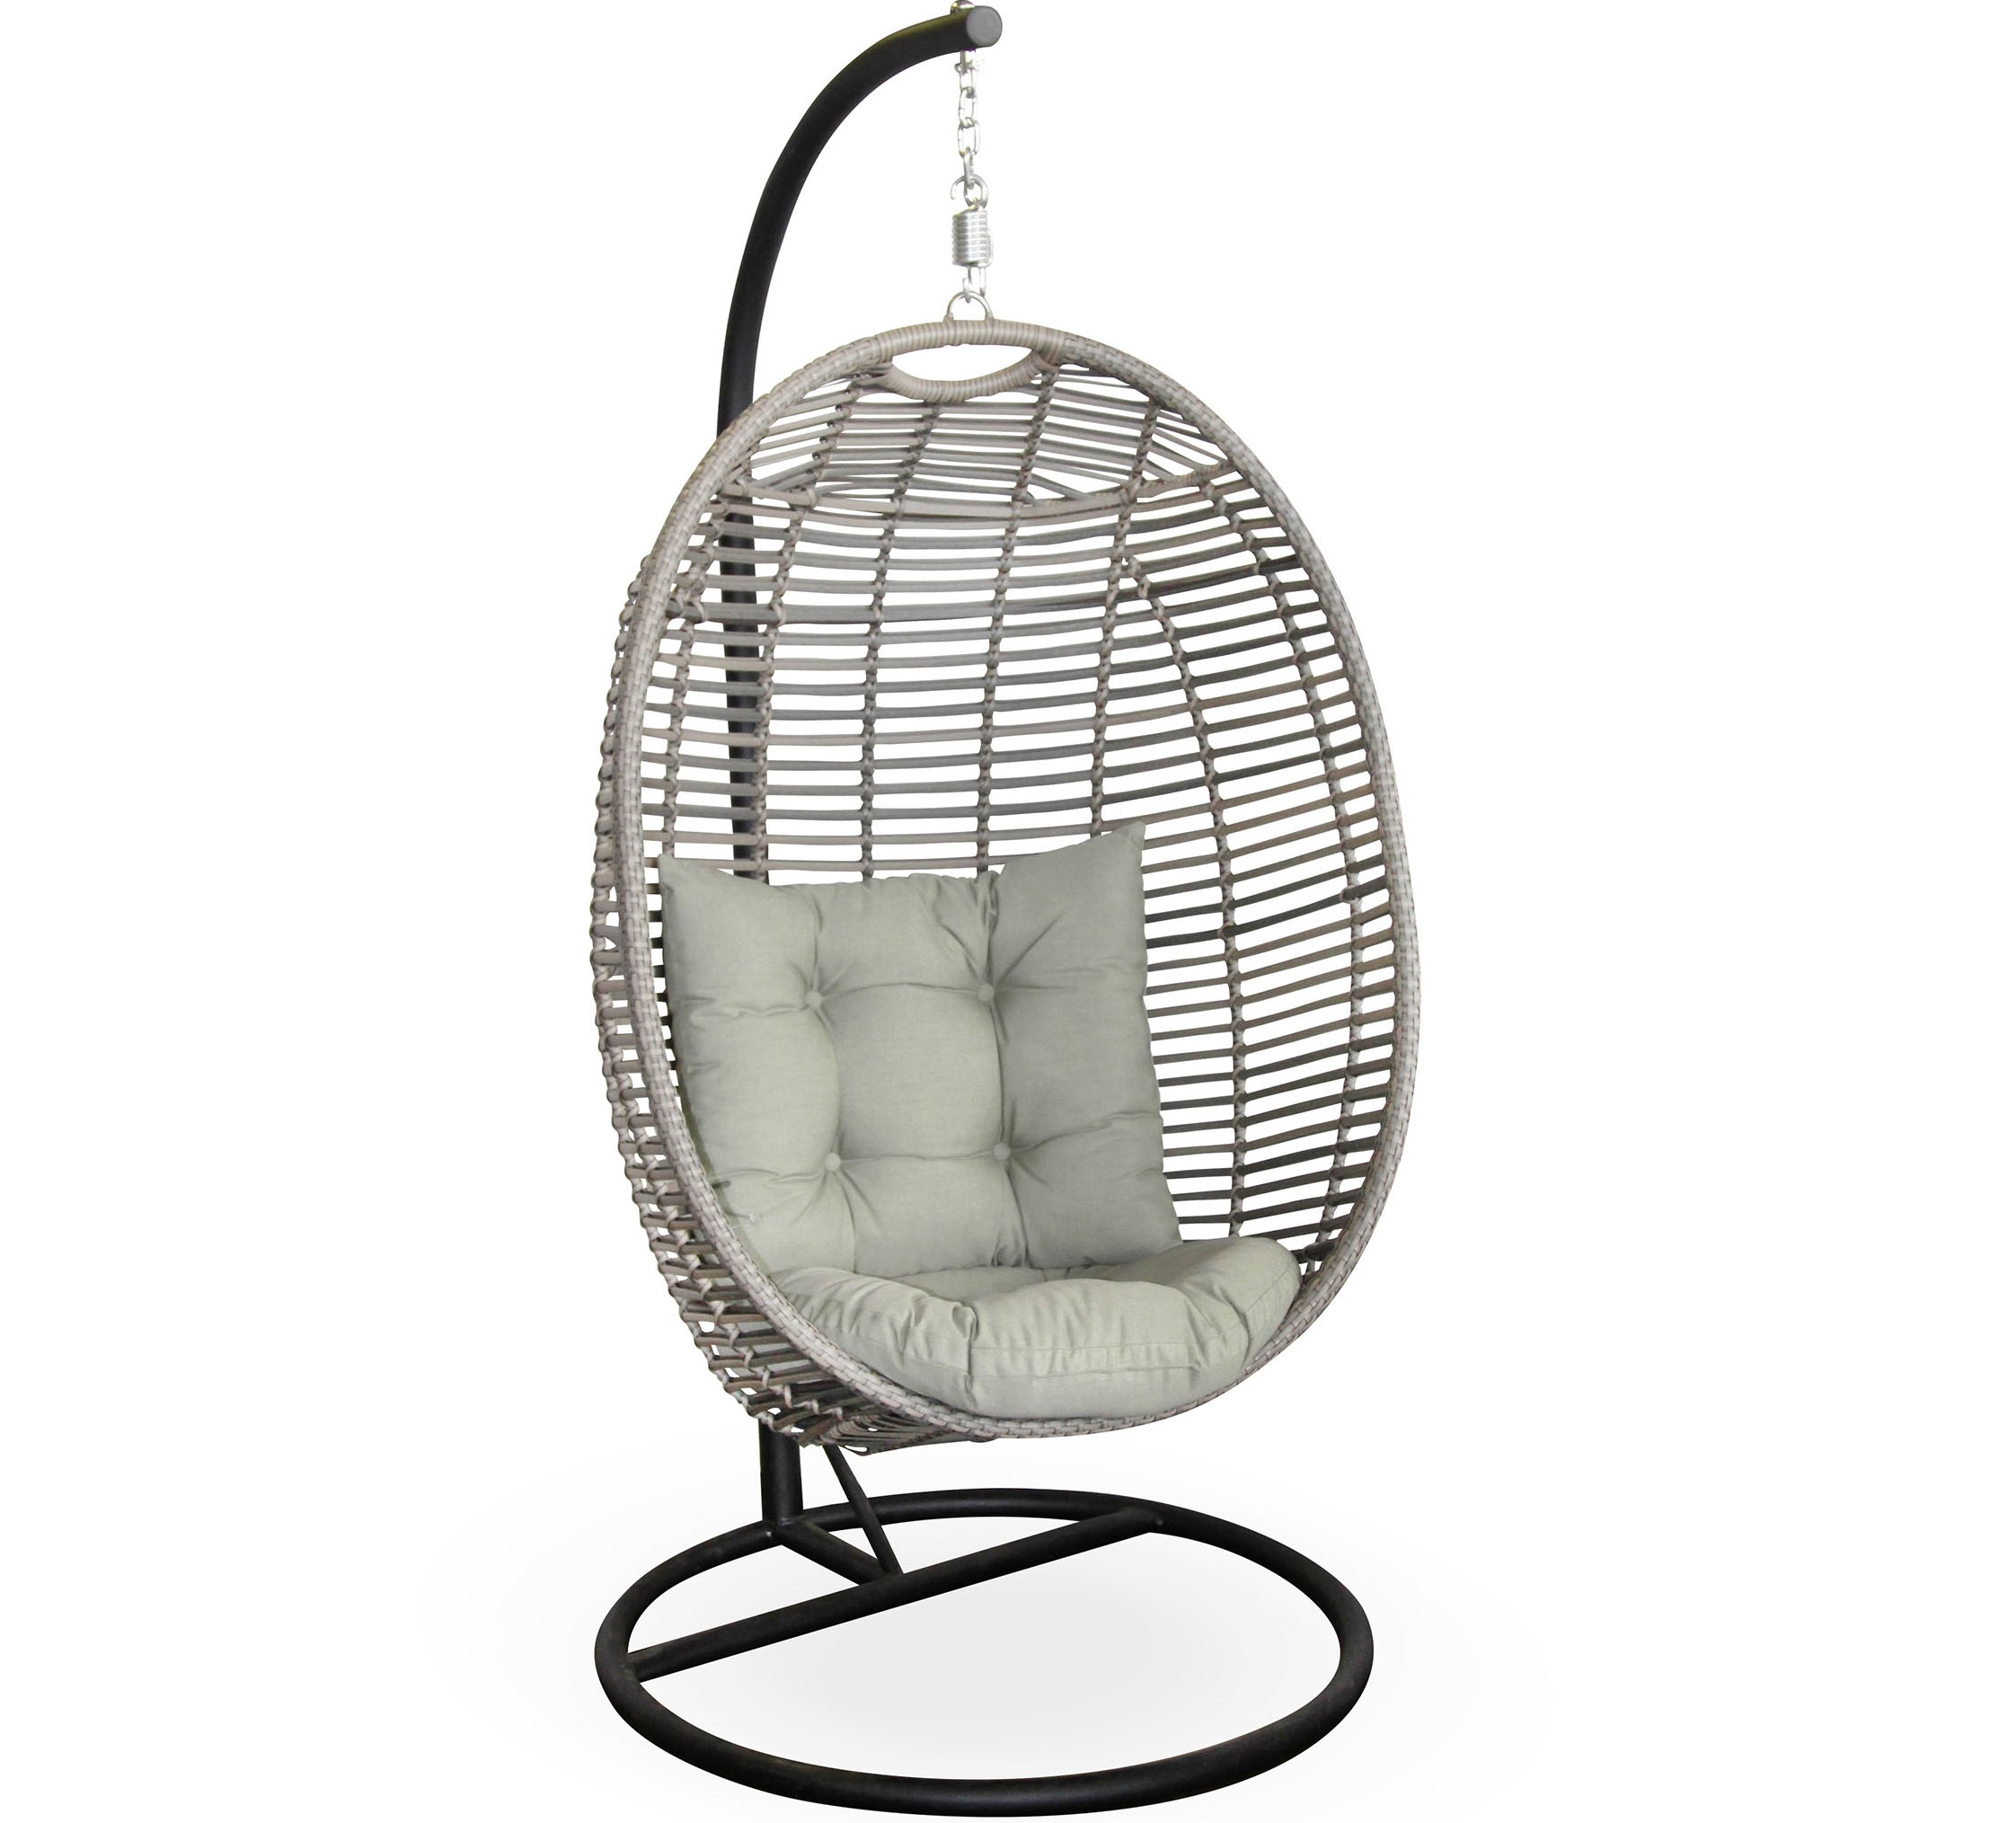 Boris hanging chair